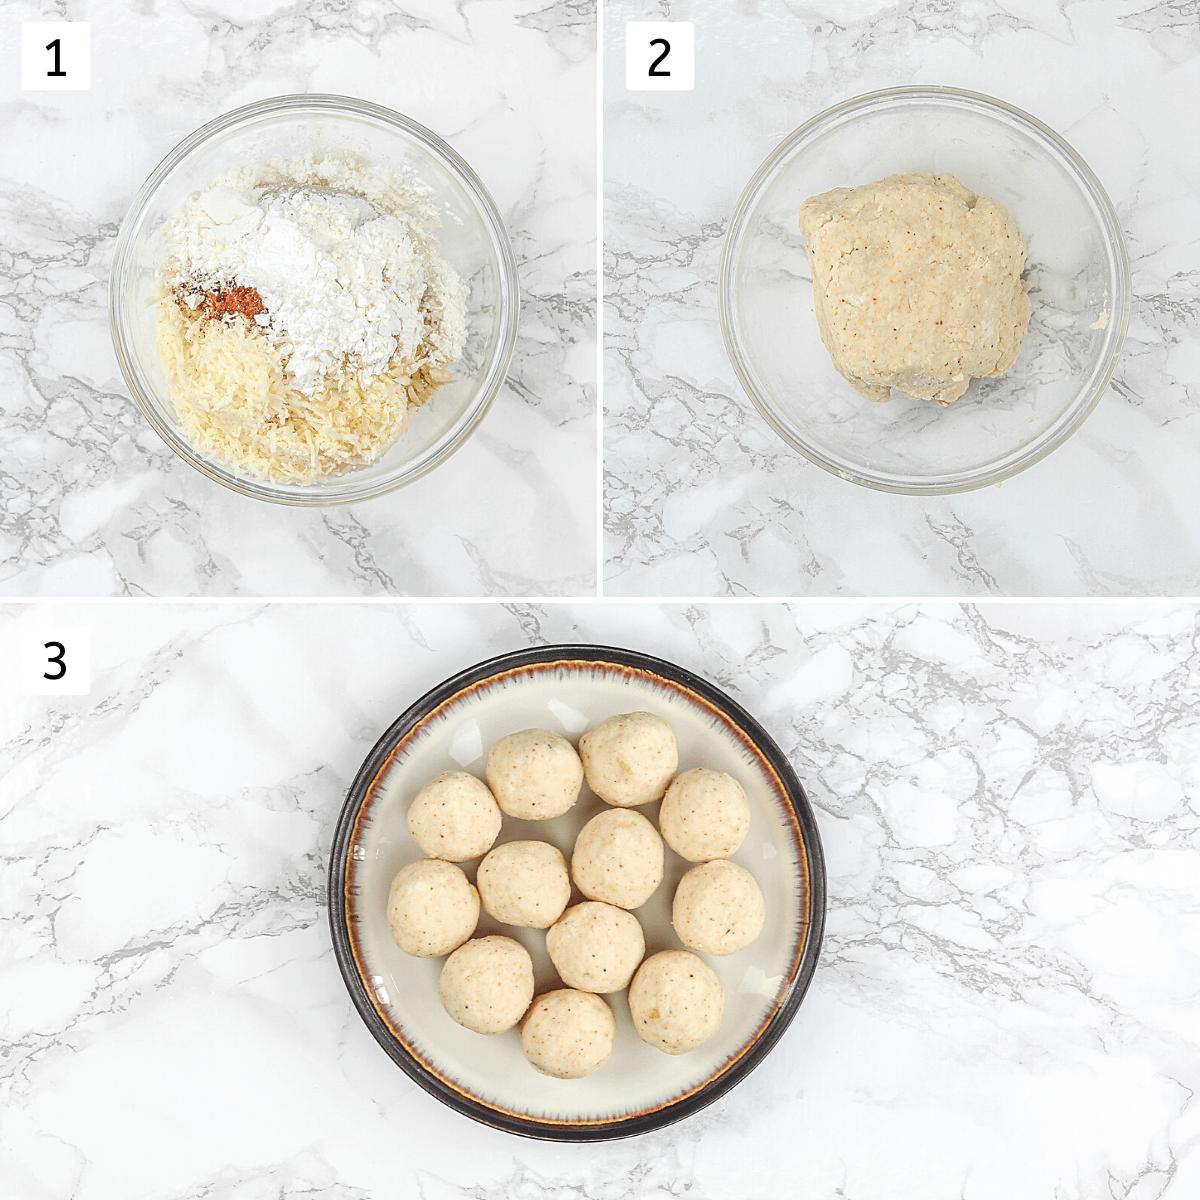 Collage of 3 steps showing making kofta mixture and shaped kofta balls.